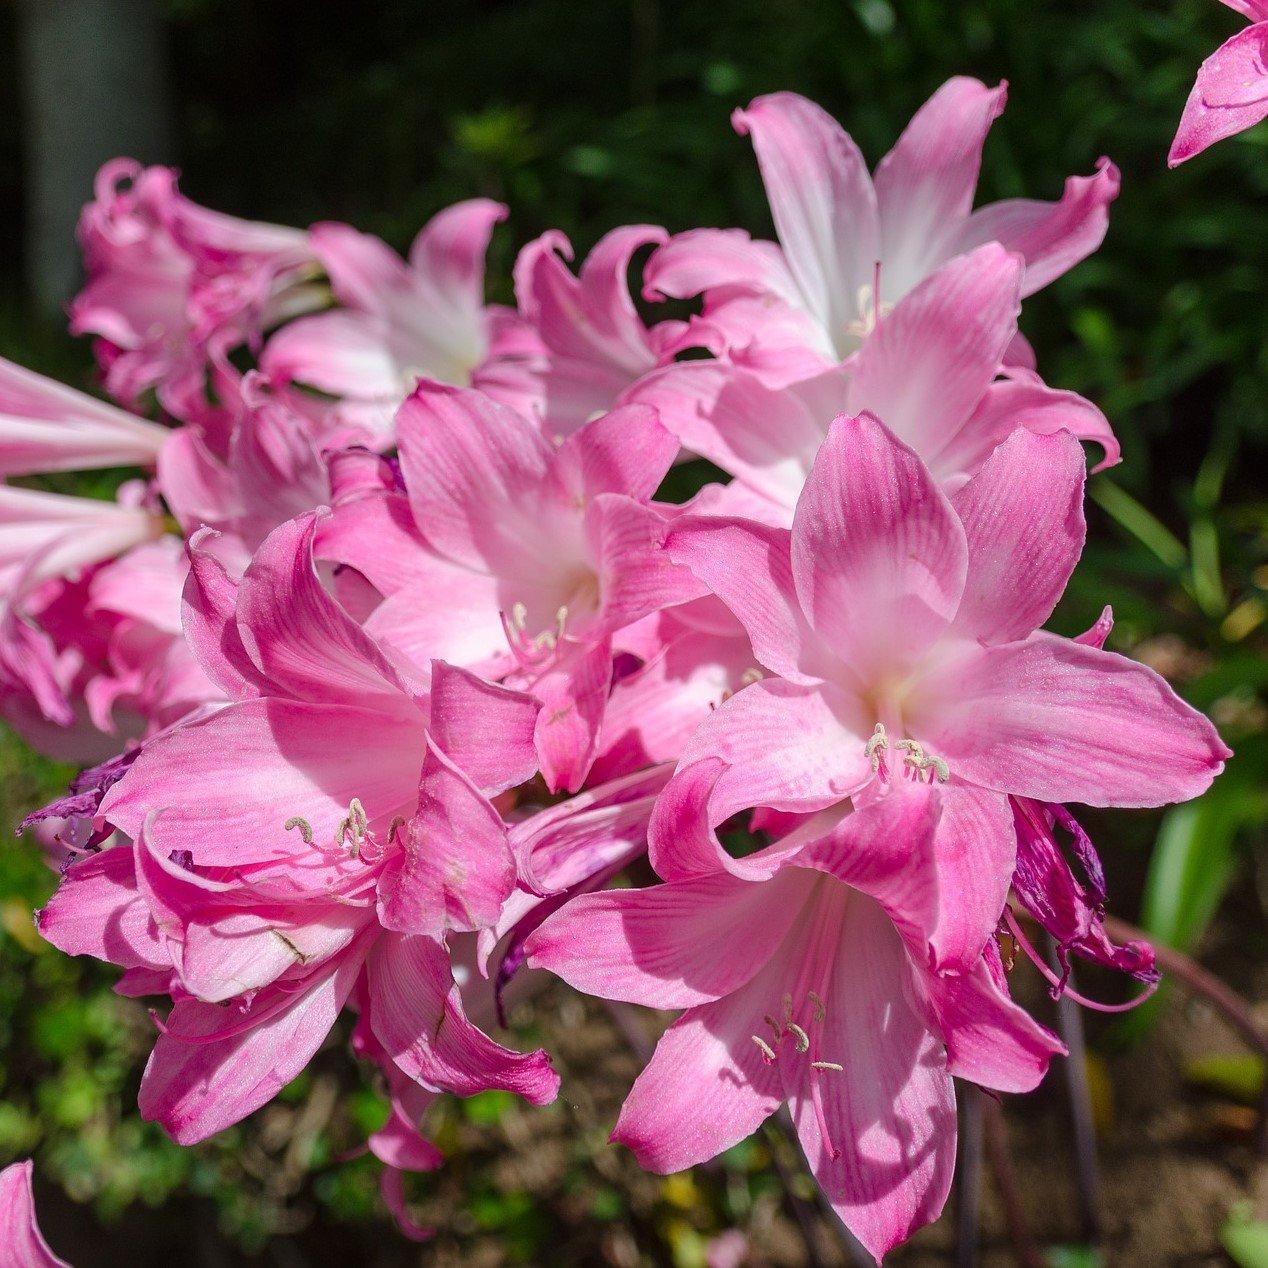 Amazon pink belladonna lily fragrant naked lady lilies 3 amazon pink belladonna lily fragrant naked lady lilies 3 big bulbs 2 12 cm easy to grow tm garden outdoor izmirmasajfo